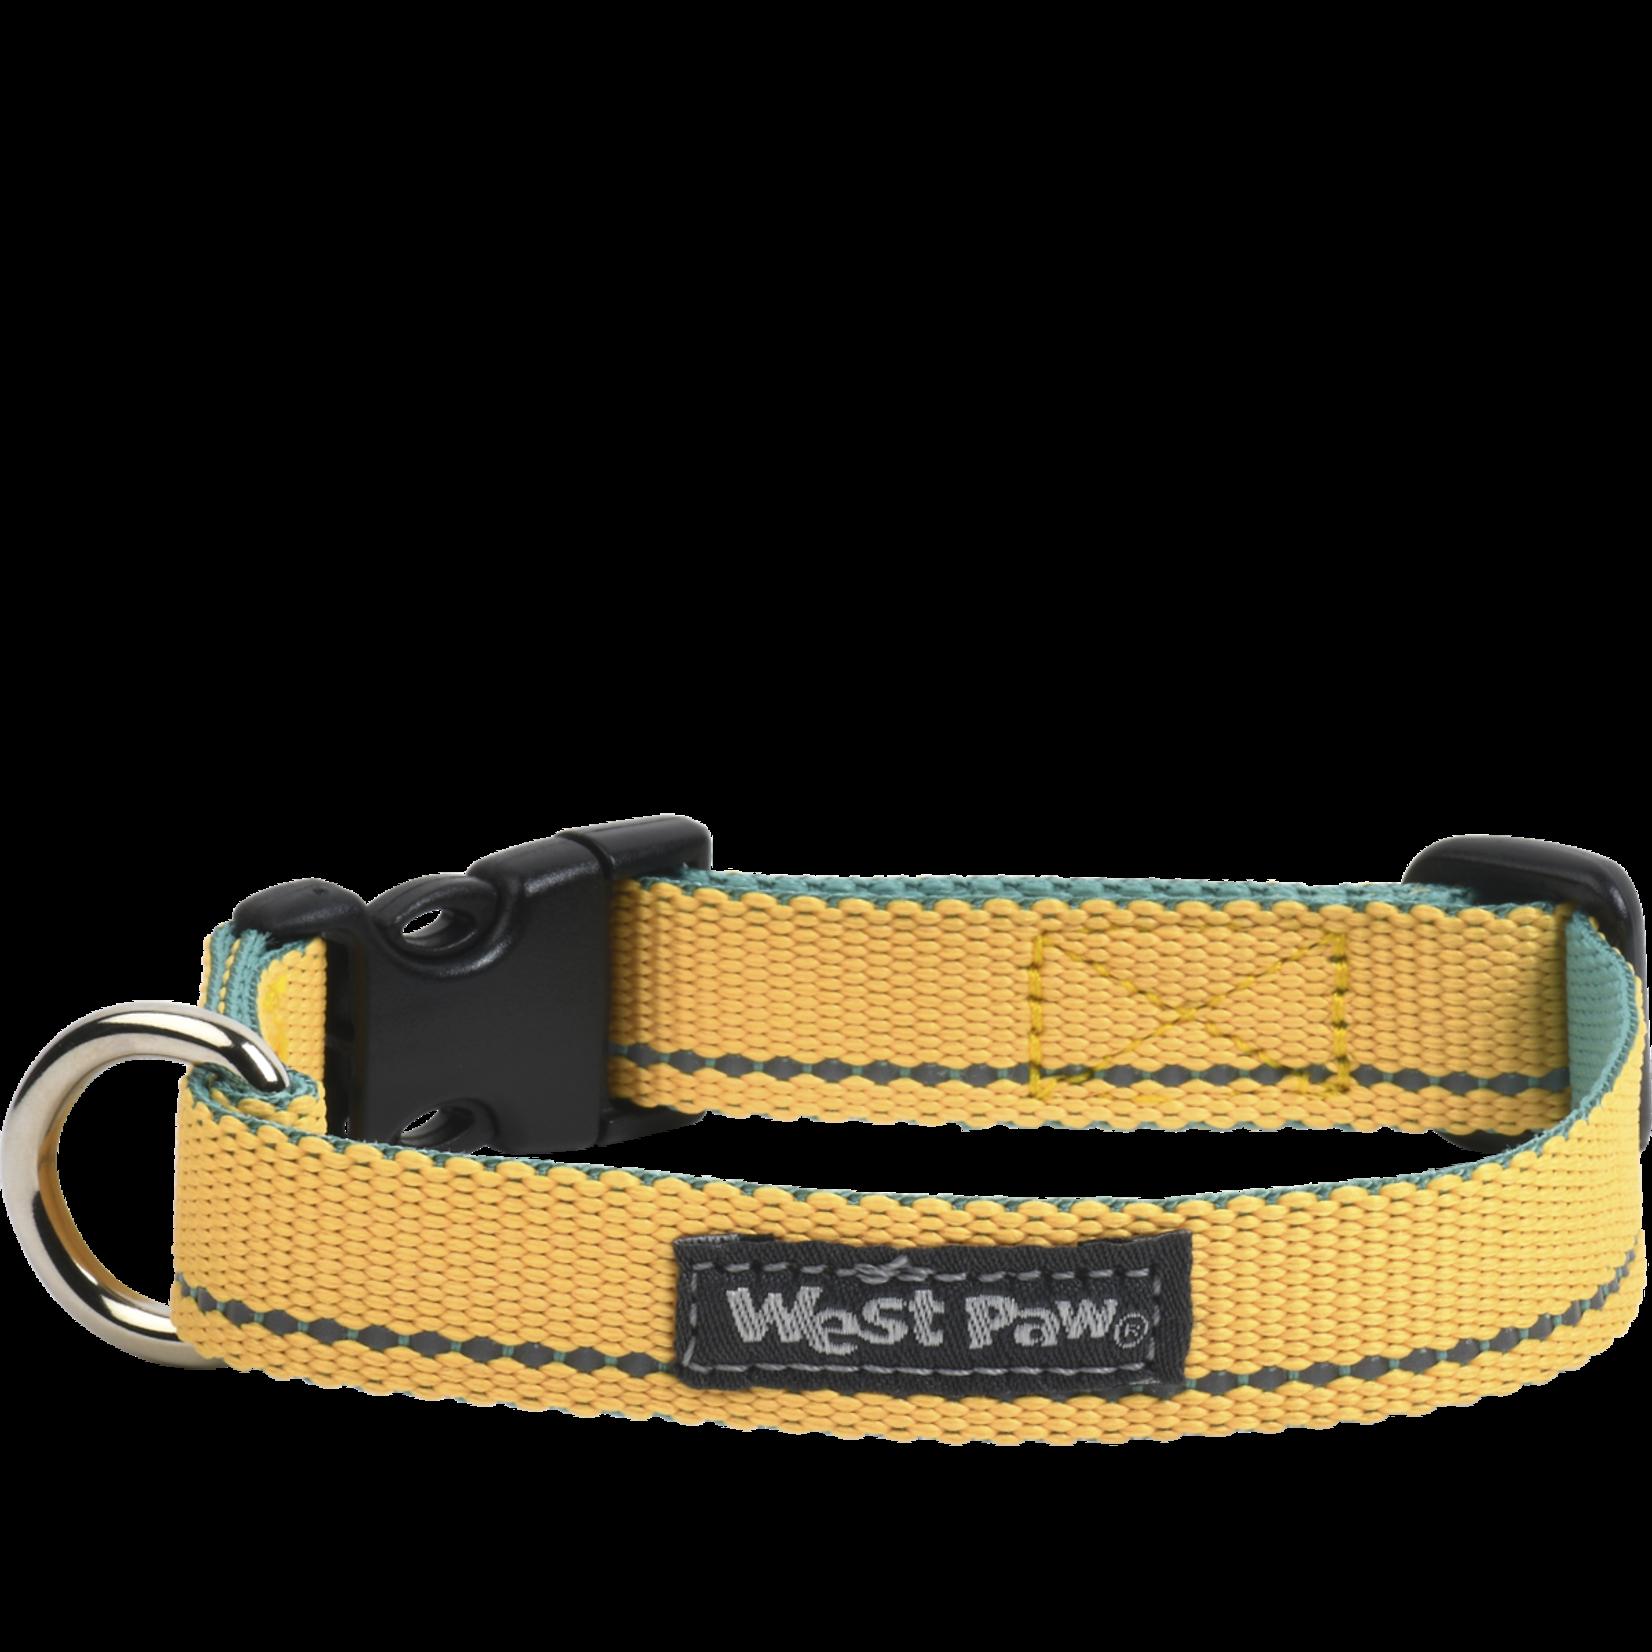 West Paw Strolls Collar - Small - Lemon Tree